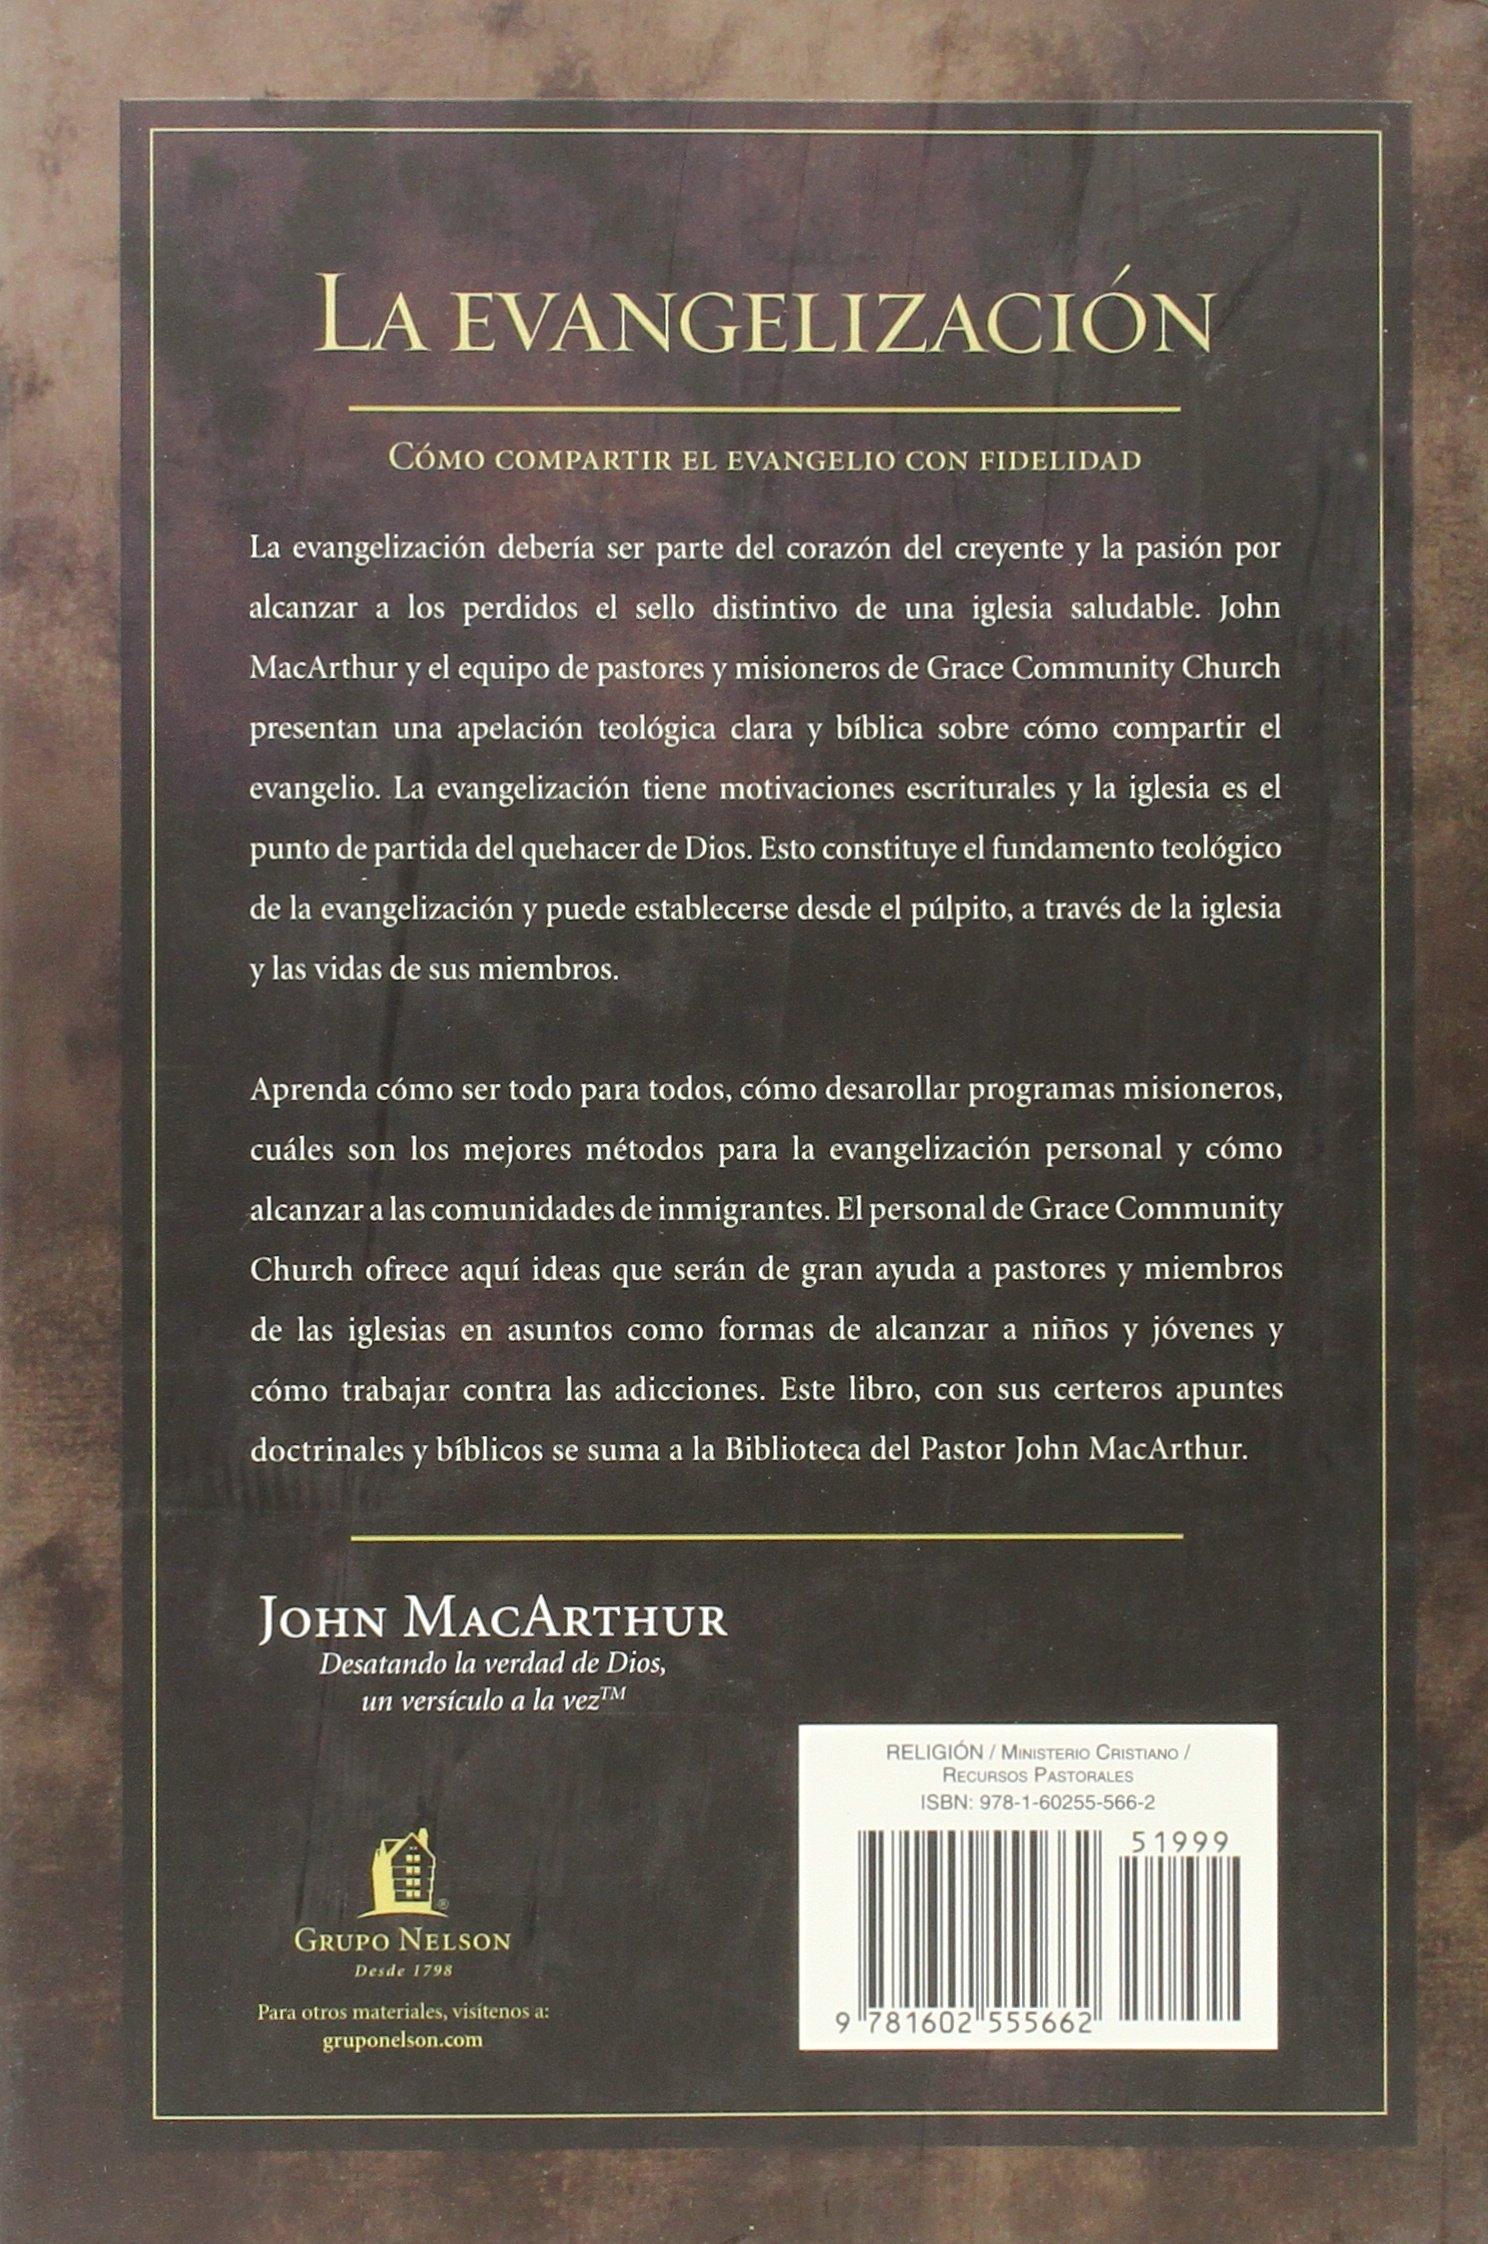 La evangelizacin john macarthur la biblioteca del pastor john la evangelizacin john macarthur la biblioteca del pastor john macarthur pastors library spanish edition john f macarthur 9781602555662 fandeluxe Images